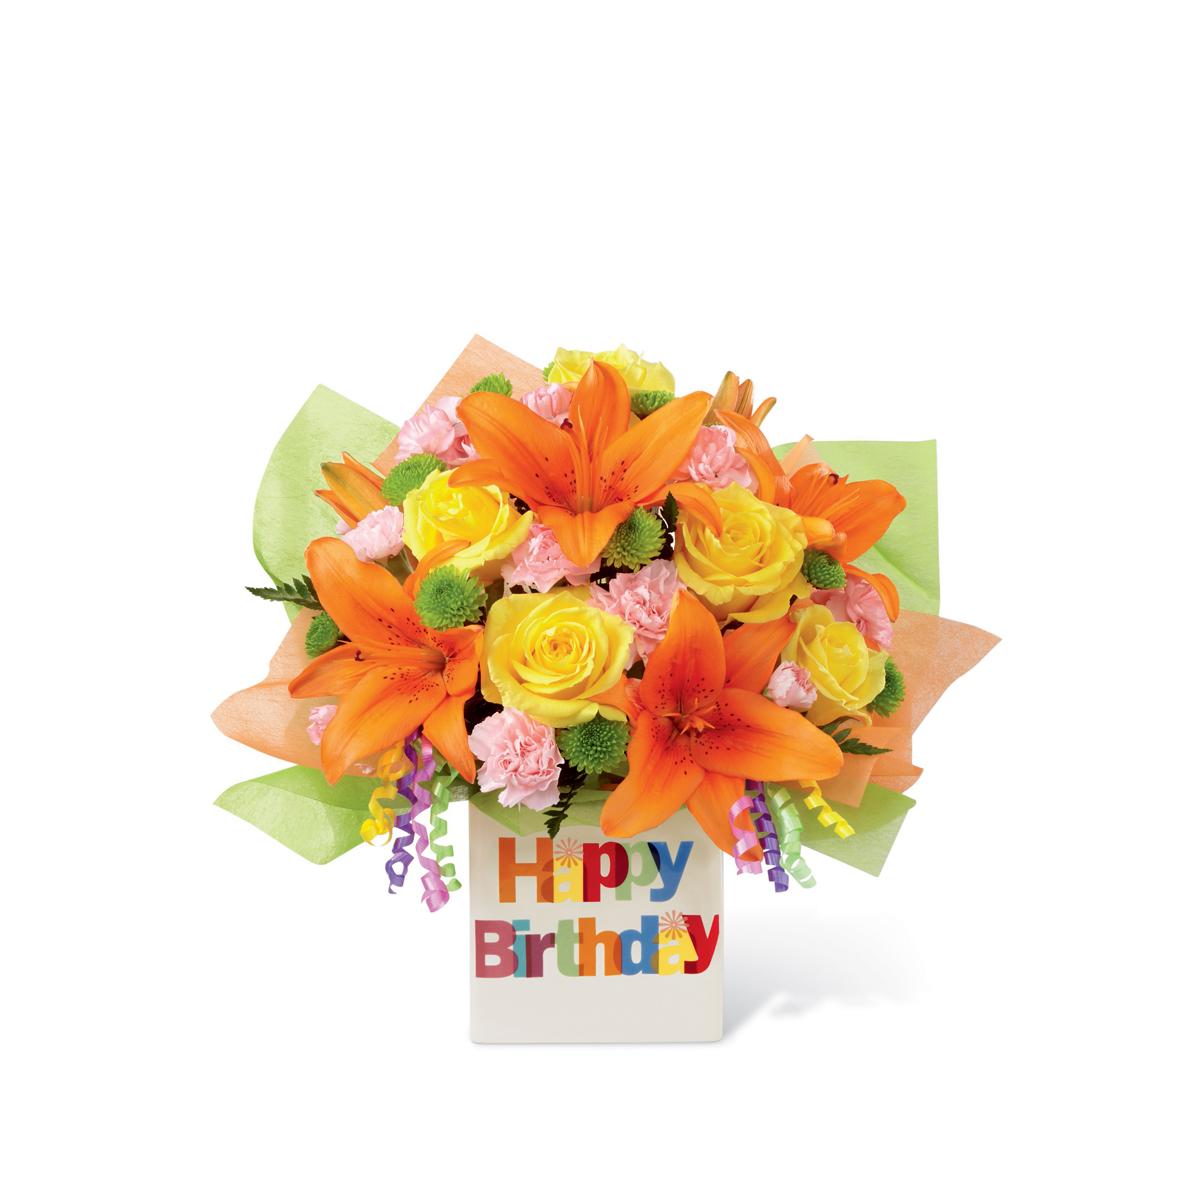 The Ftd Birthday Celebration B Altamonte Springs Fl Florist